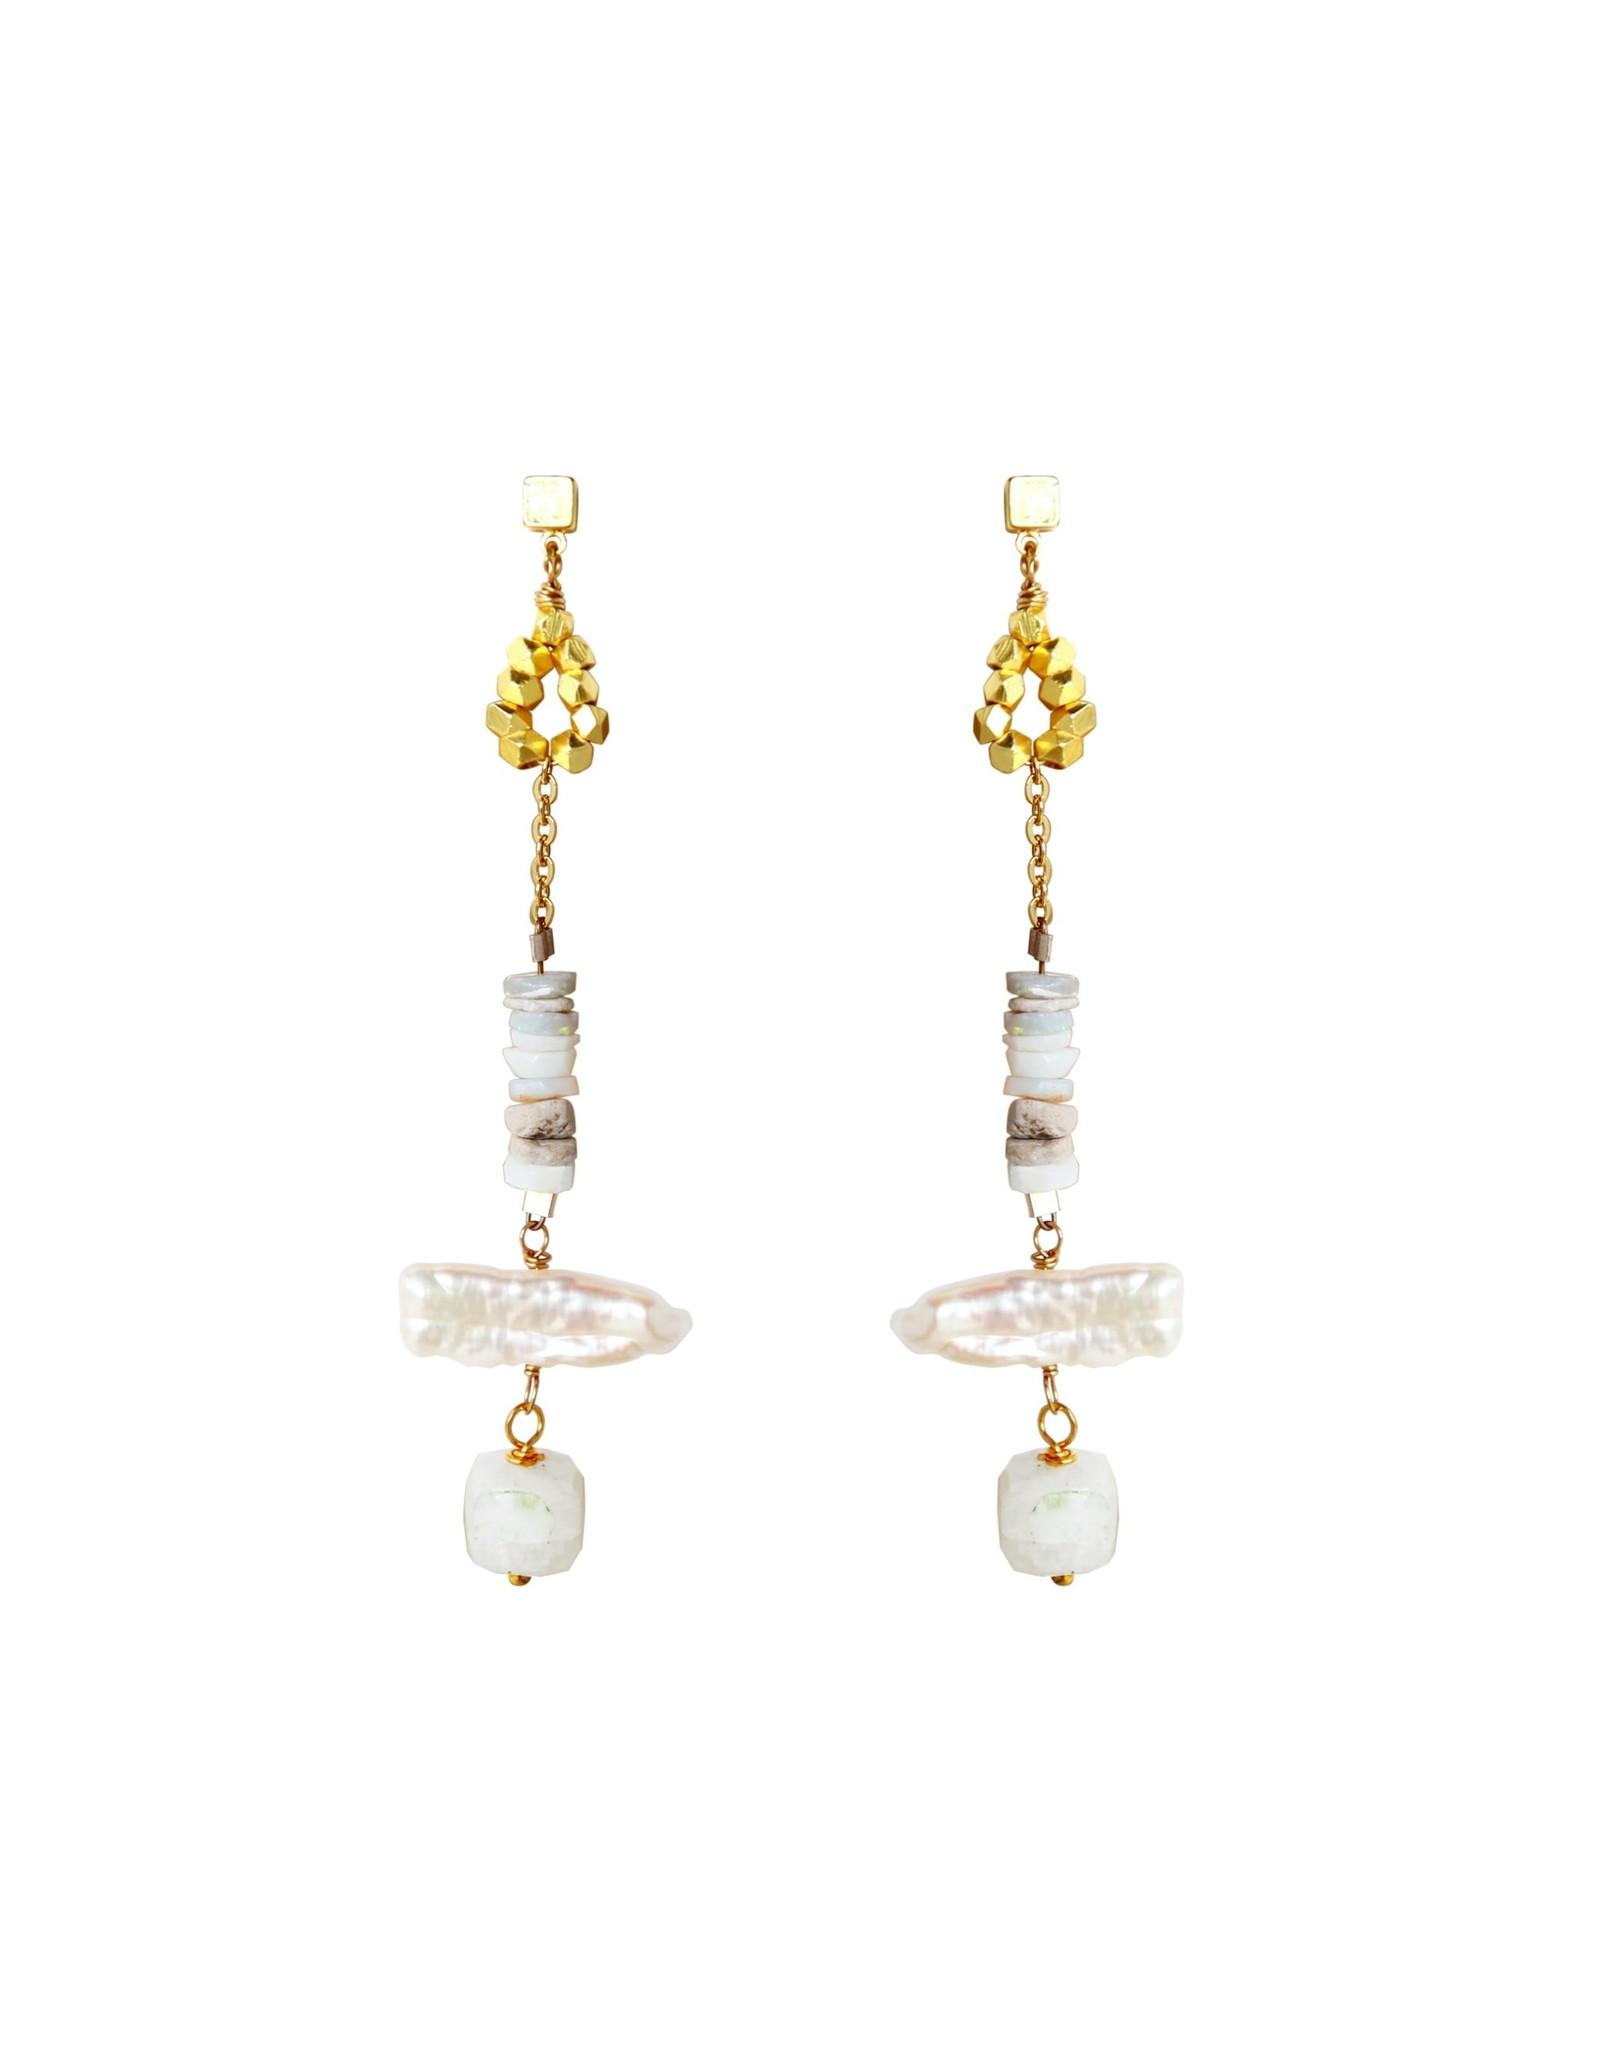 Catherine Page Jewelry Slide Earrings